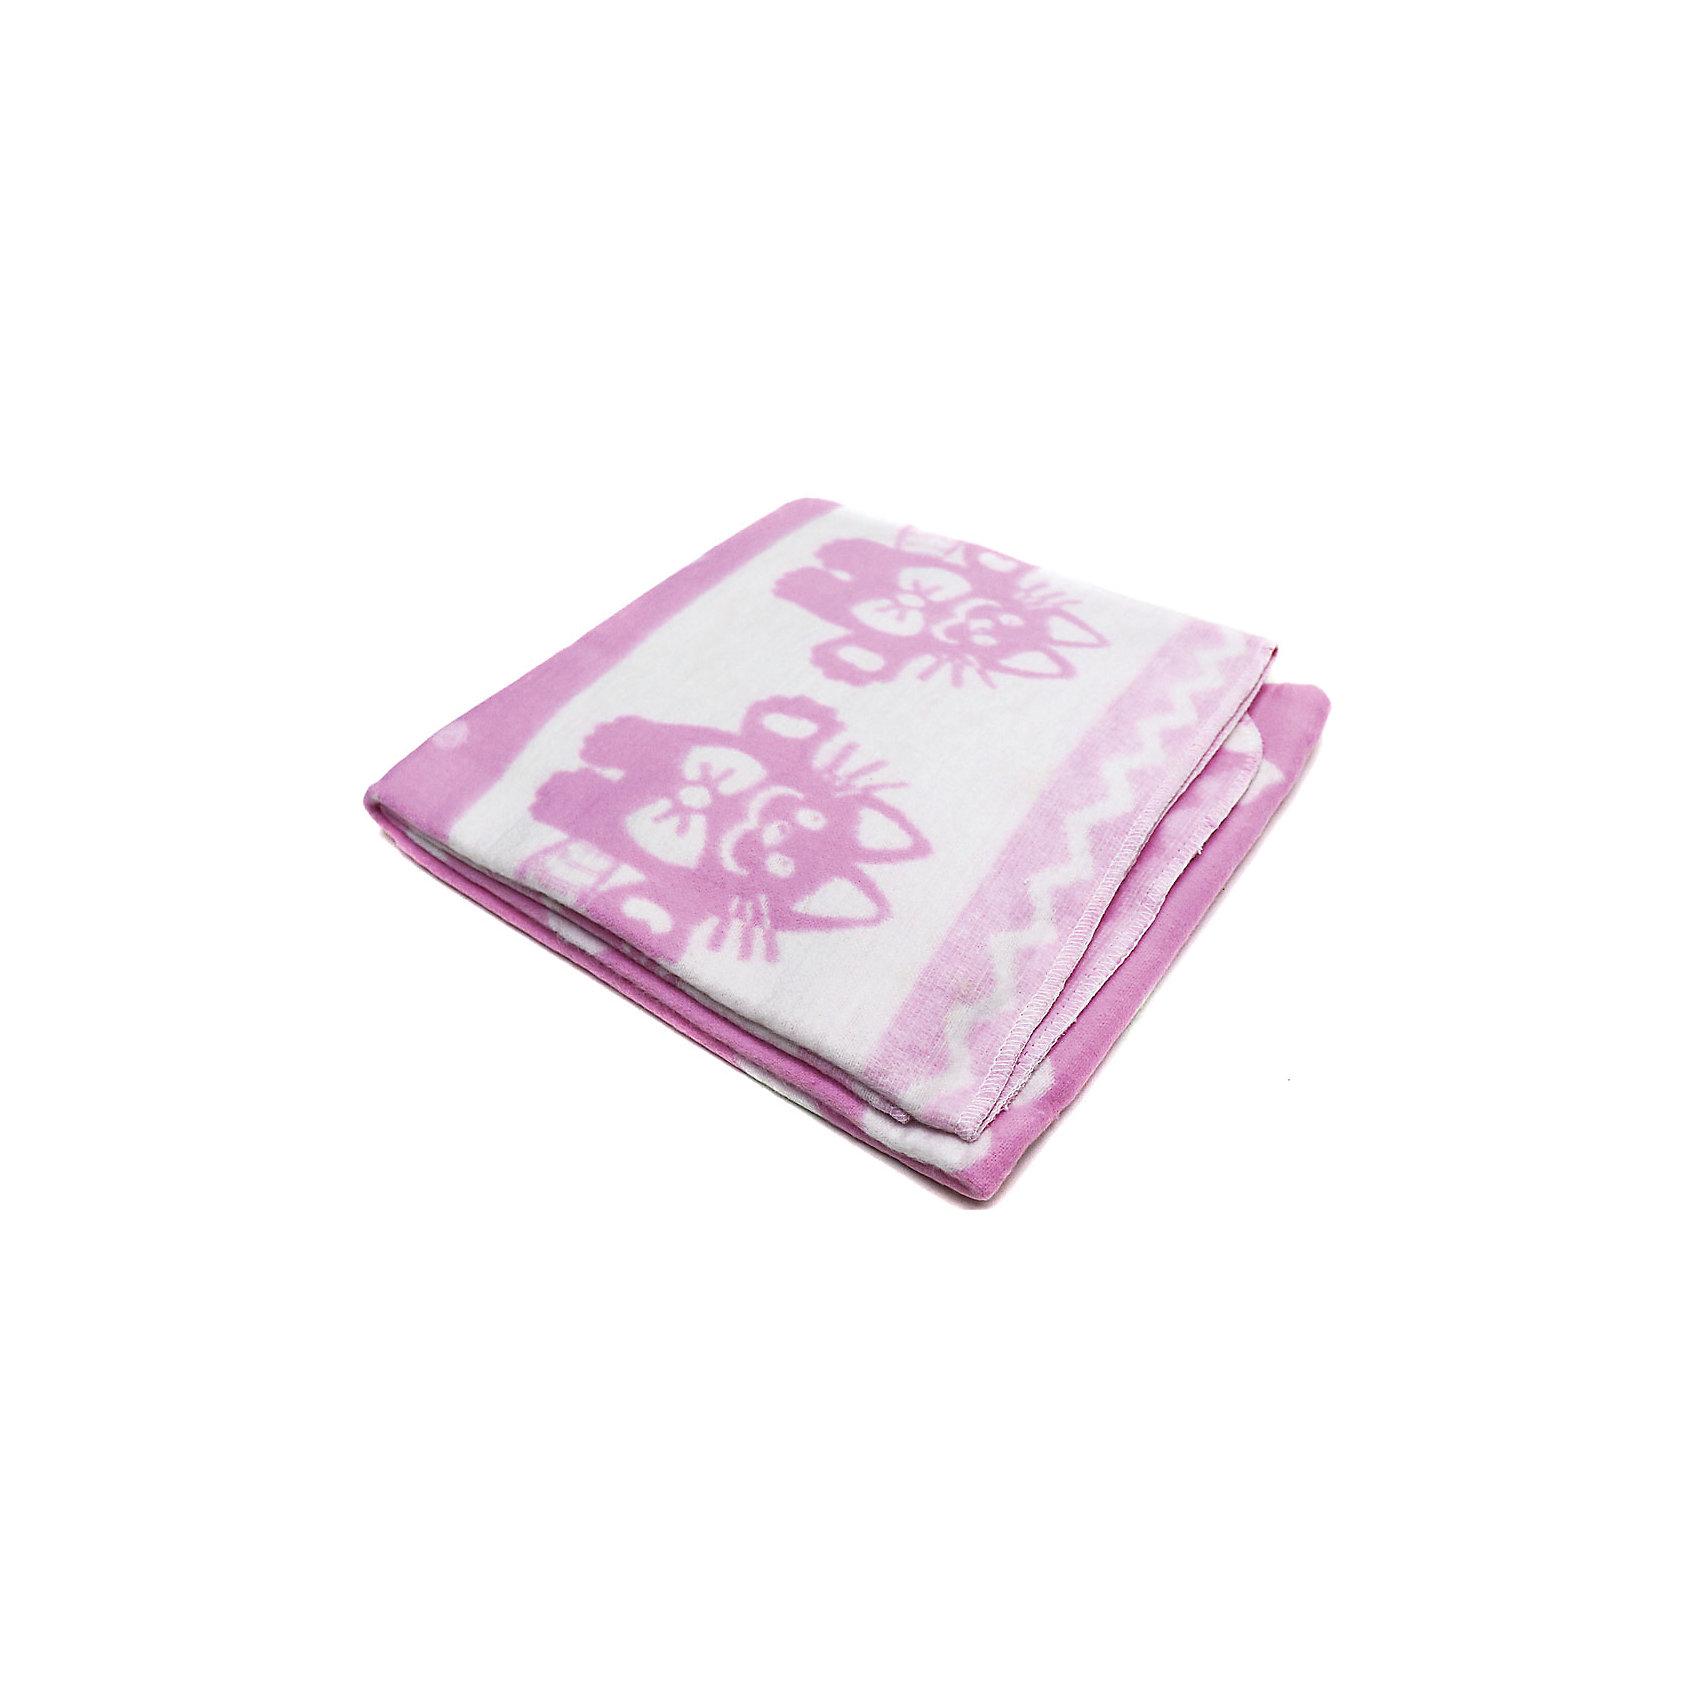 Ермолино Байковое одеяло х/б 140х100 см., Топотушки, розовый б у столярное оборудование